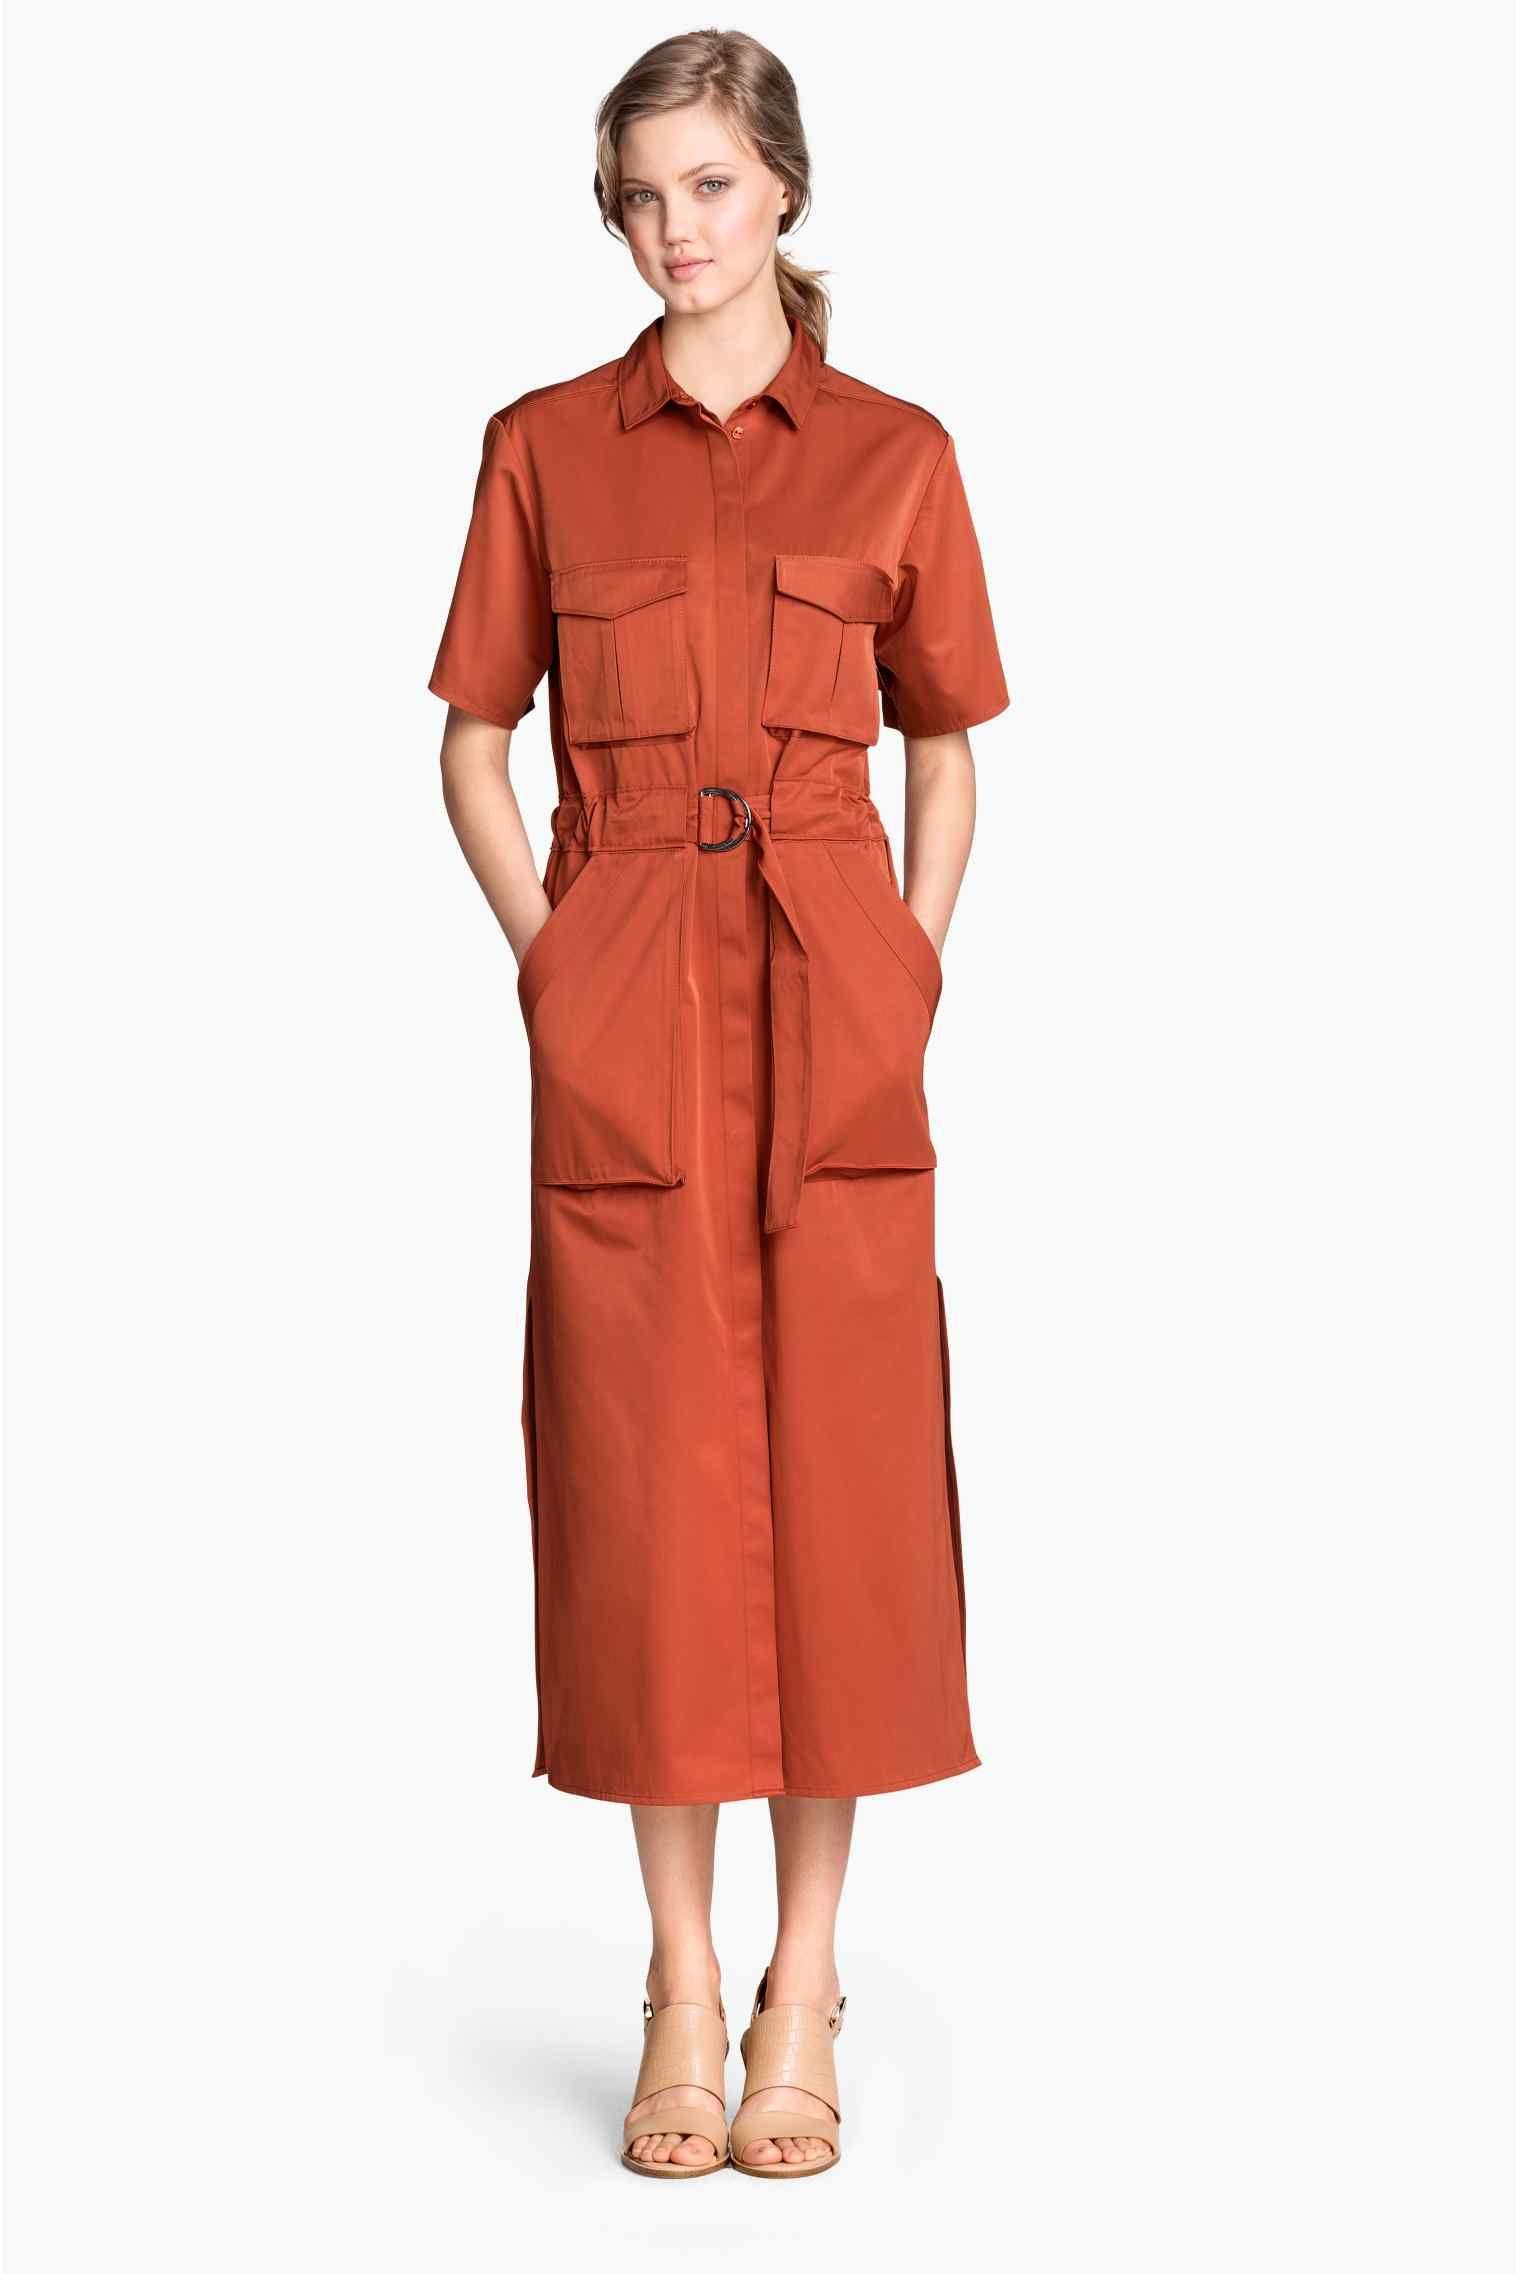 robe chemise longue h m robe saharienne en 2019 robe. Black Bedroom Furniture Sets. Home Design Ideas